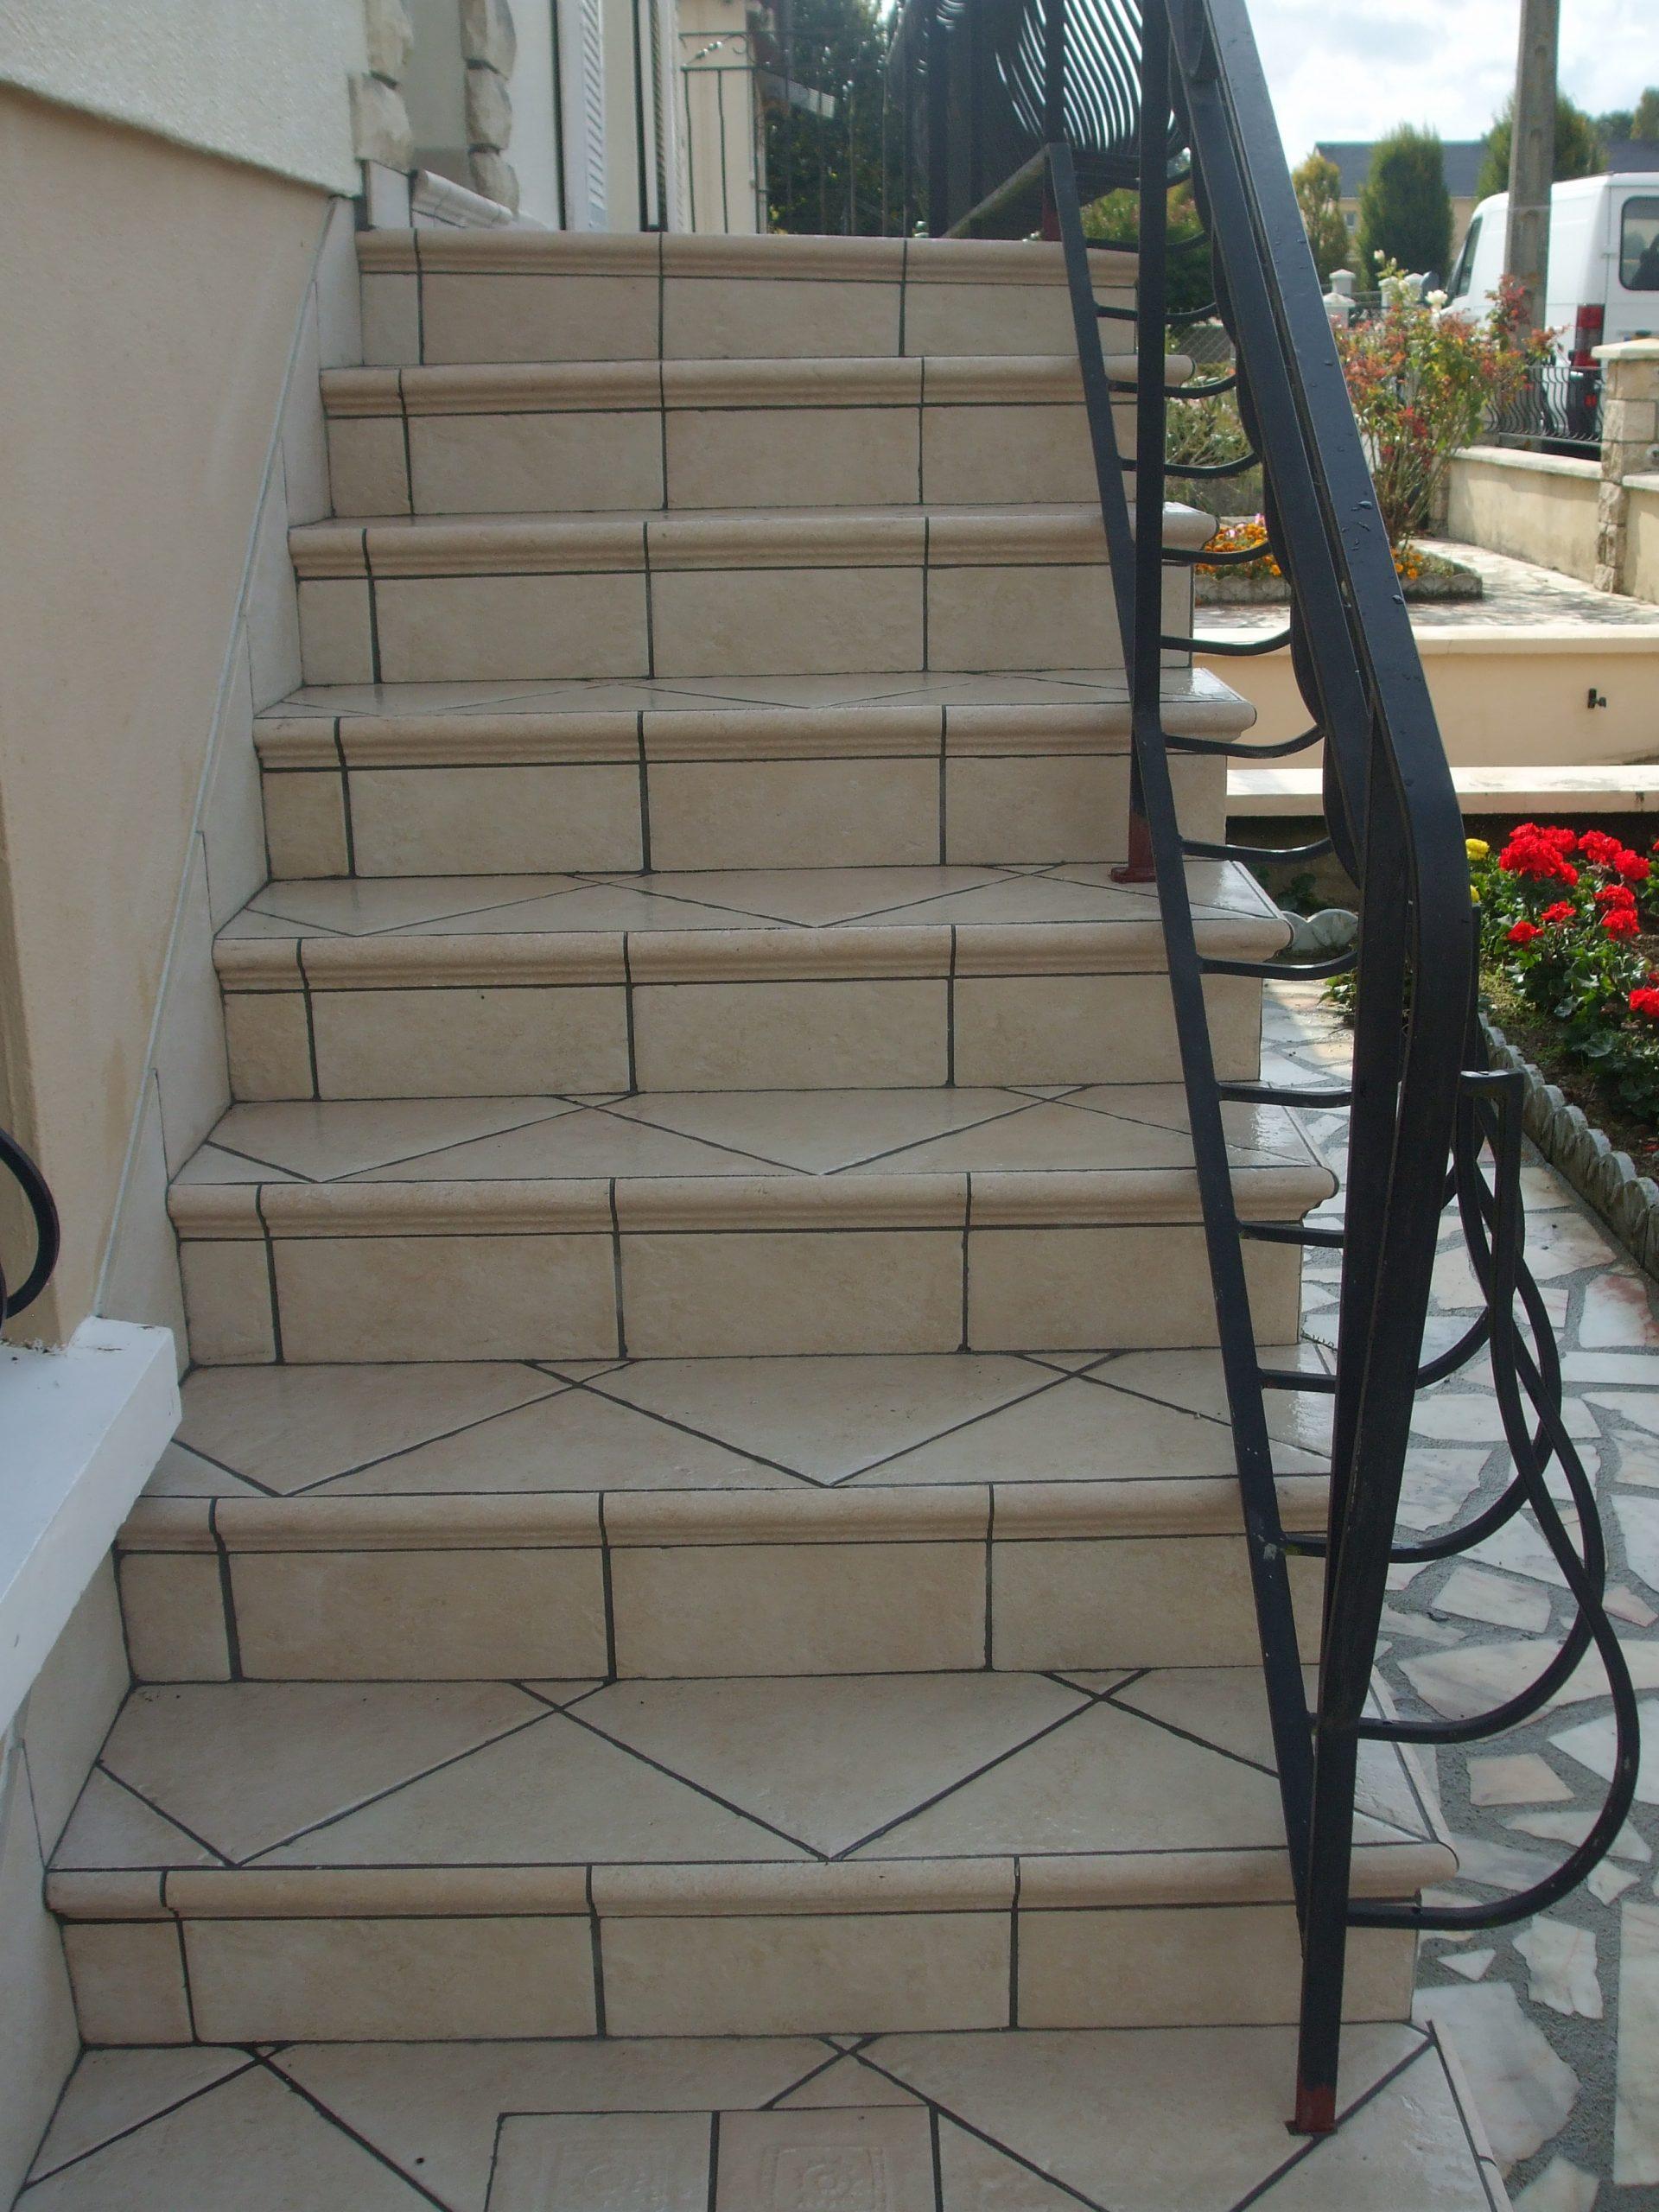 Les Escaliers Extérieurs - Sarl Papin Alainsarl Papin Alain à Carrelage Escalier Extérieur